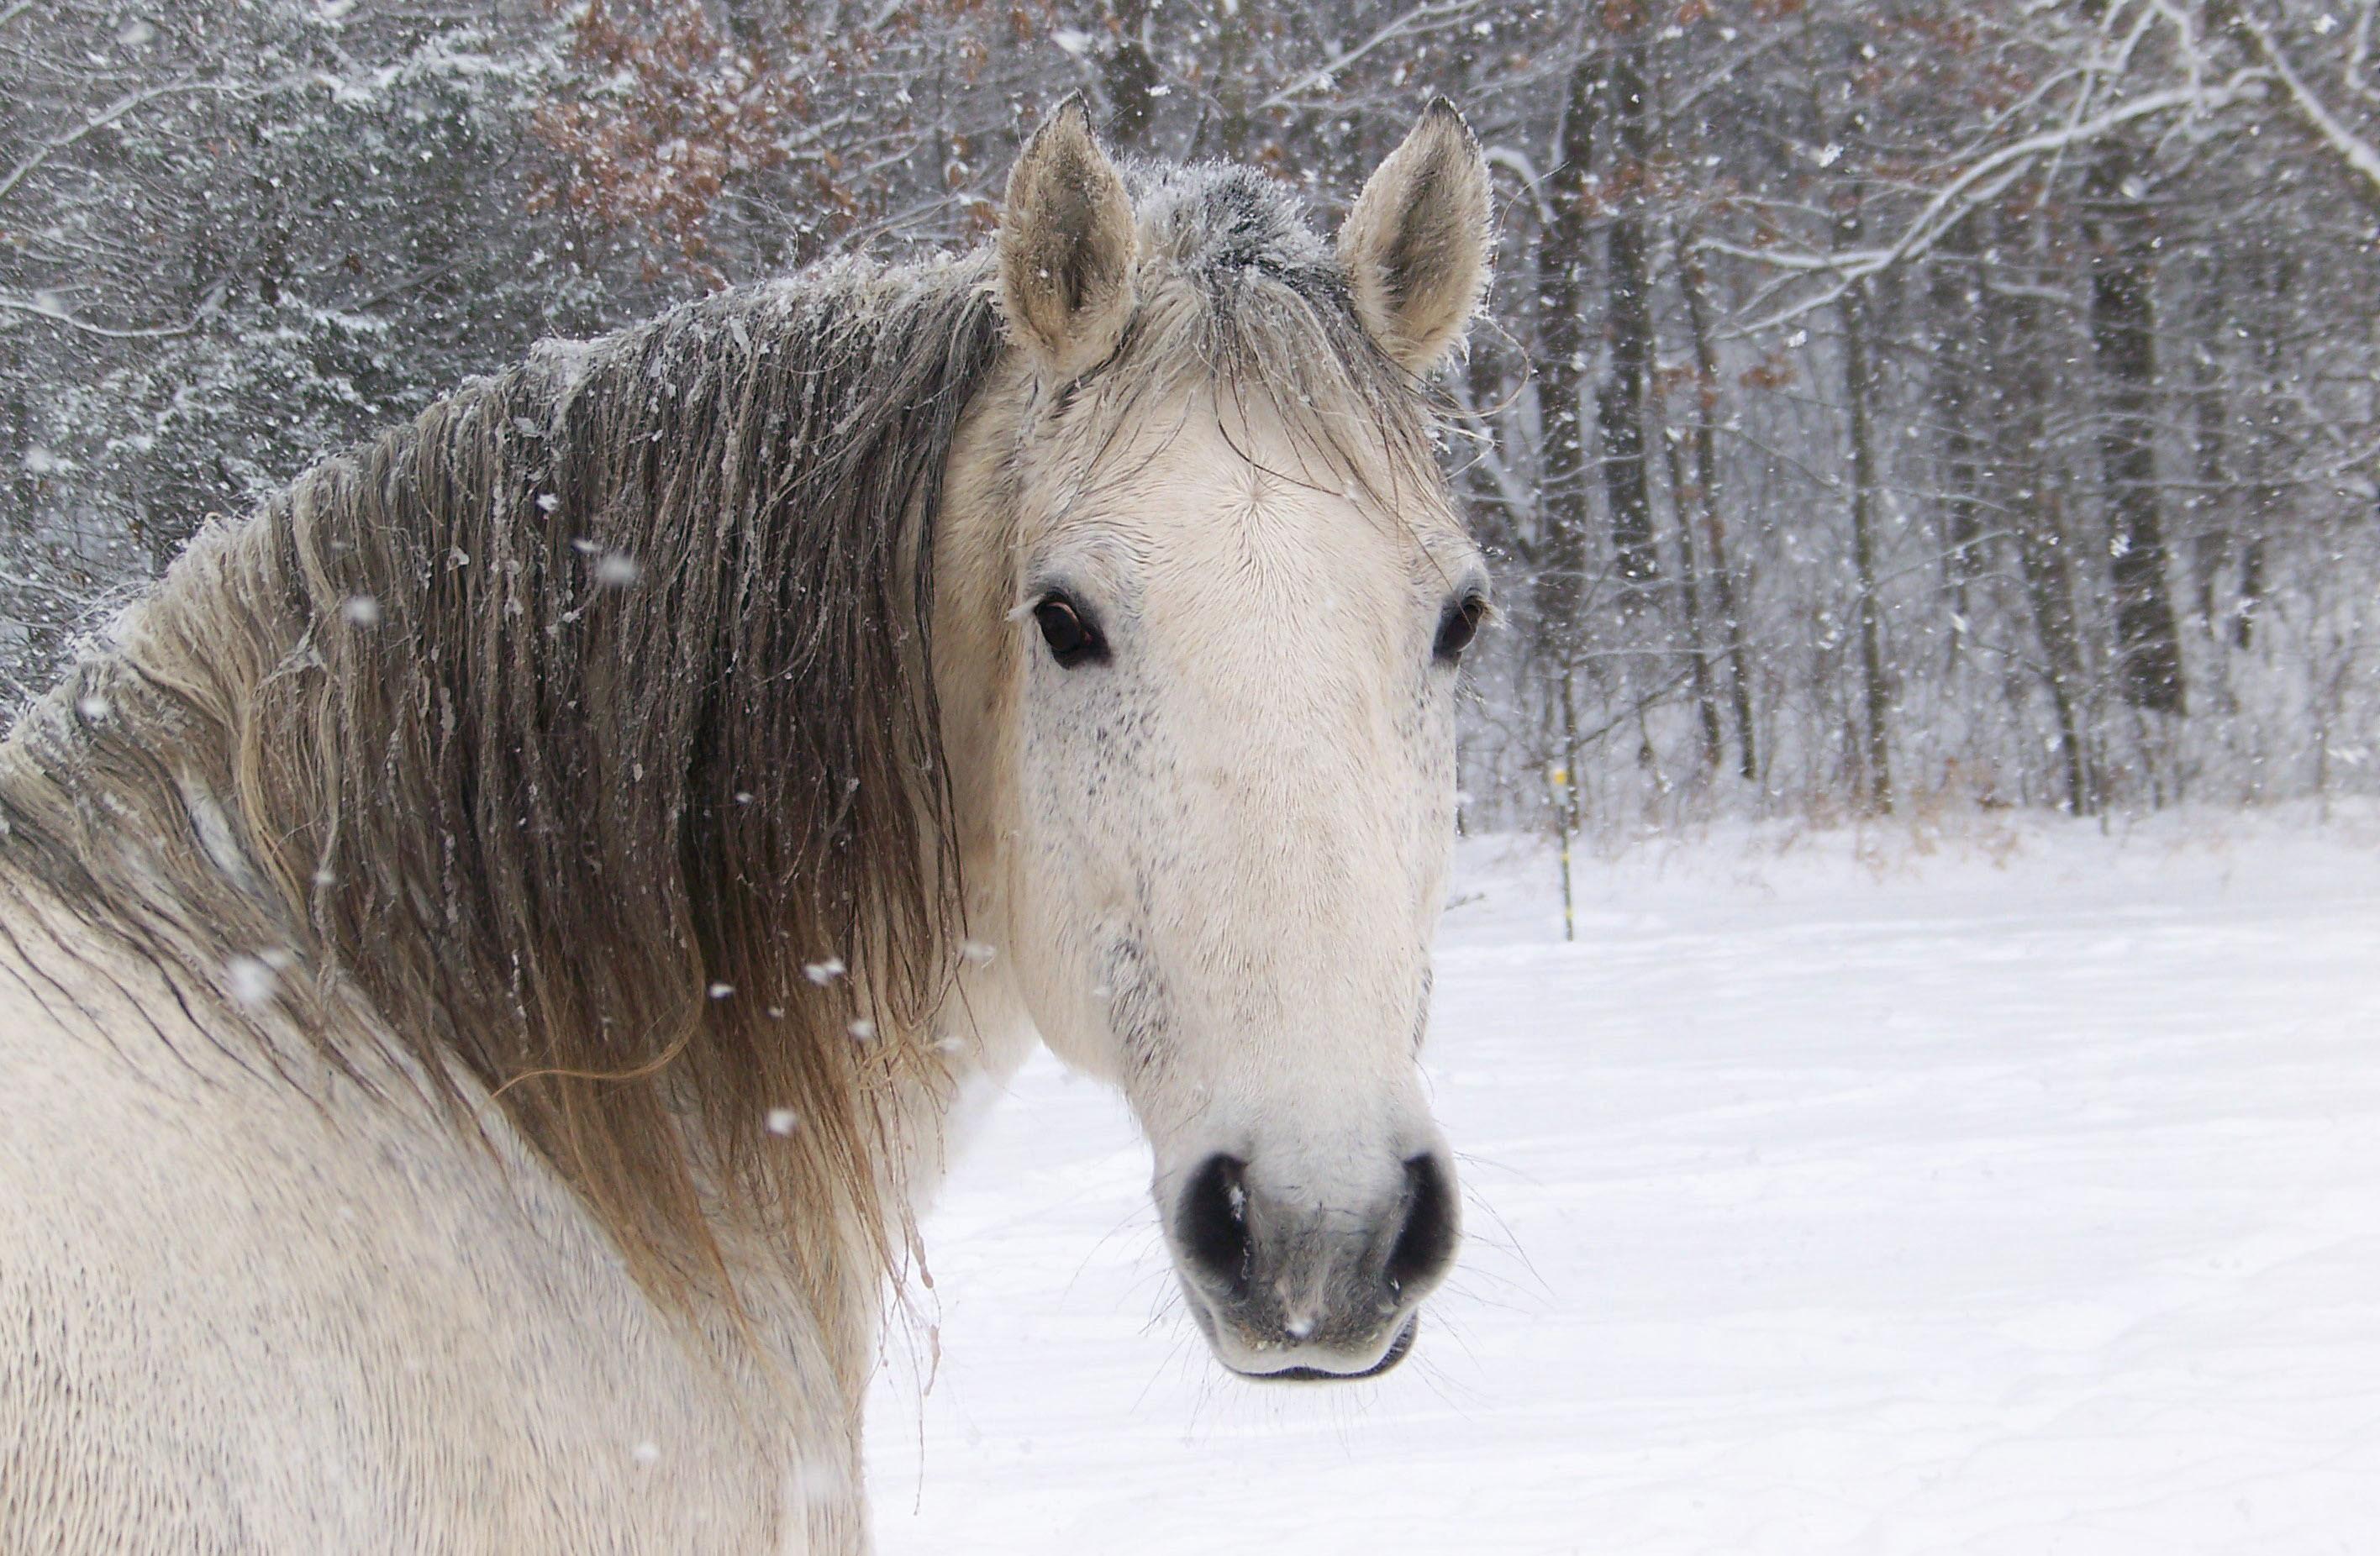 Horse Winter Head Snowflake Snow wallpaper | | 151717 .